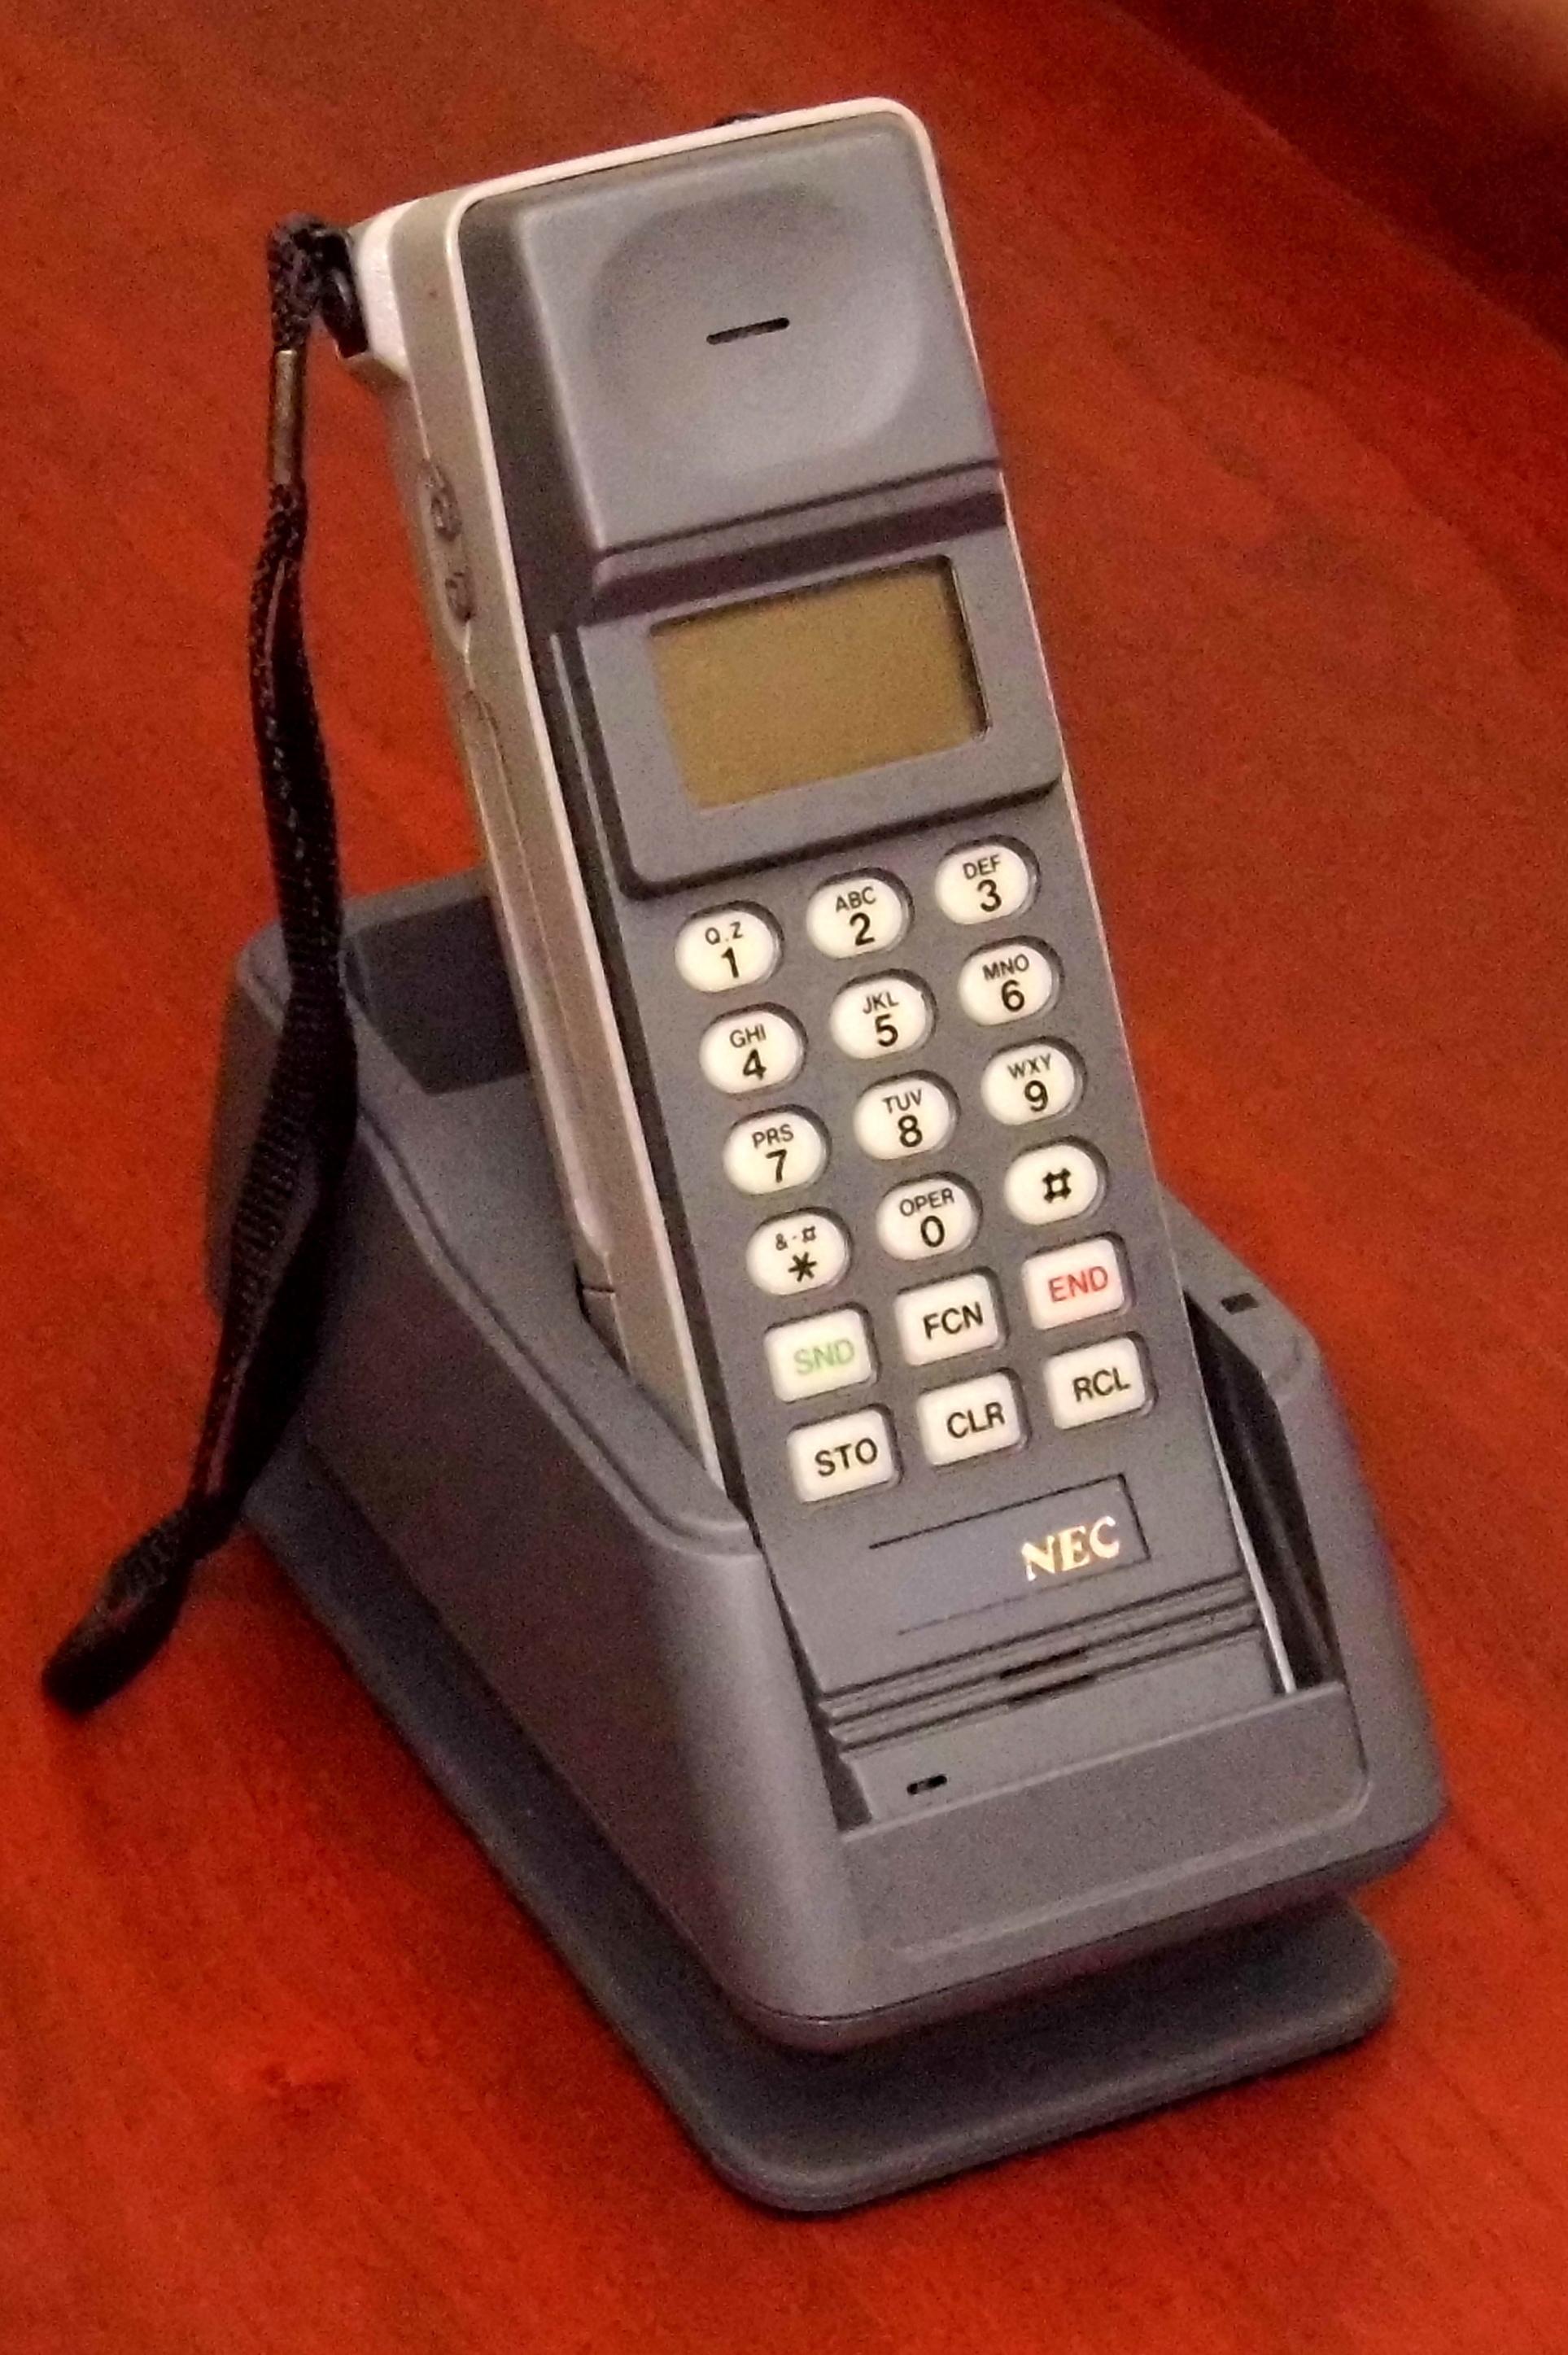 Nec i series phone manual